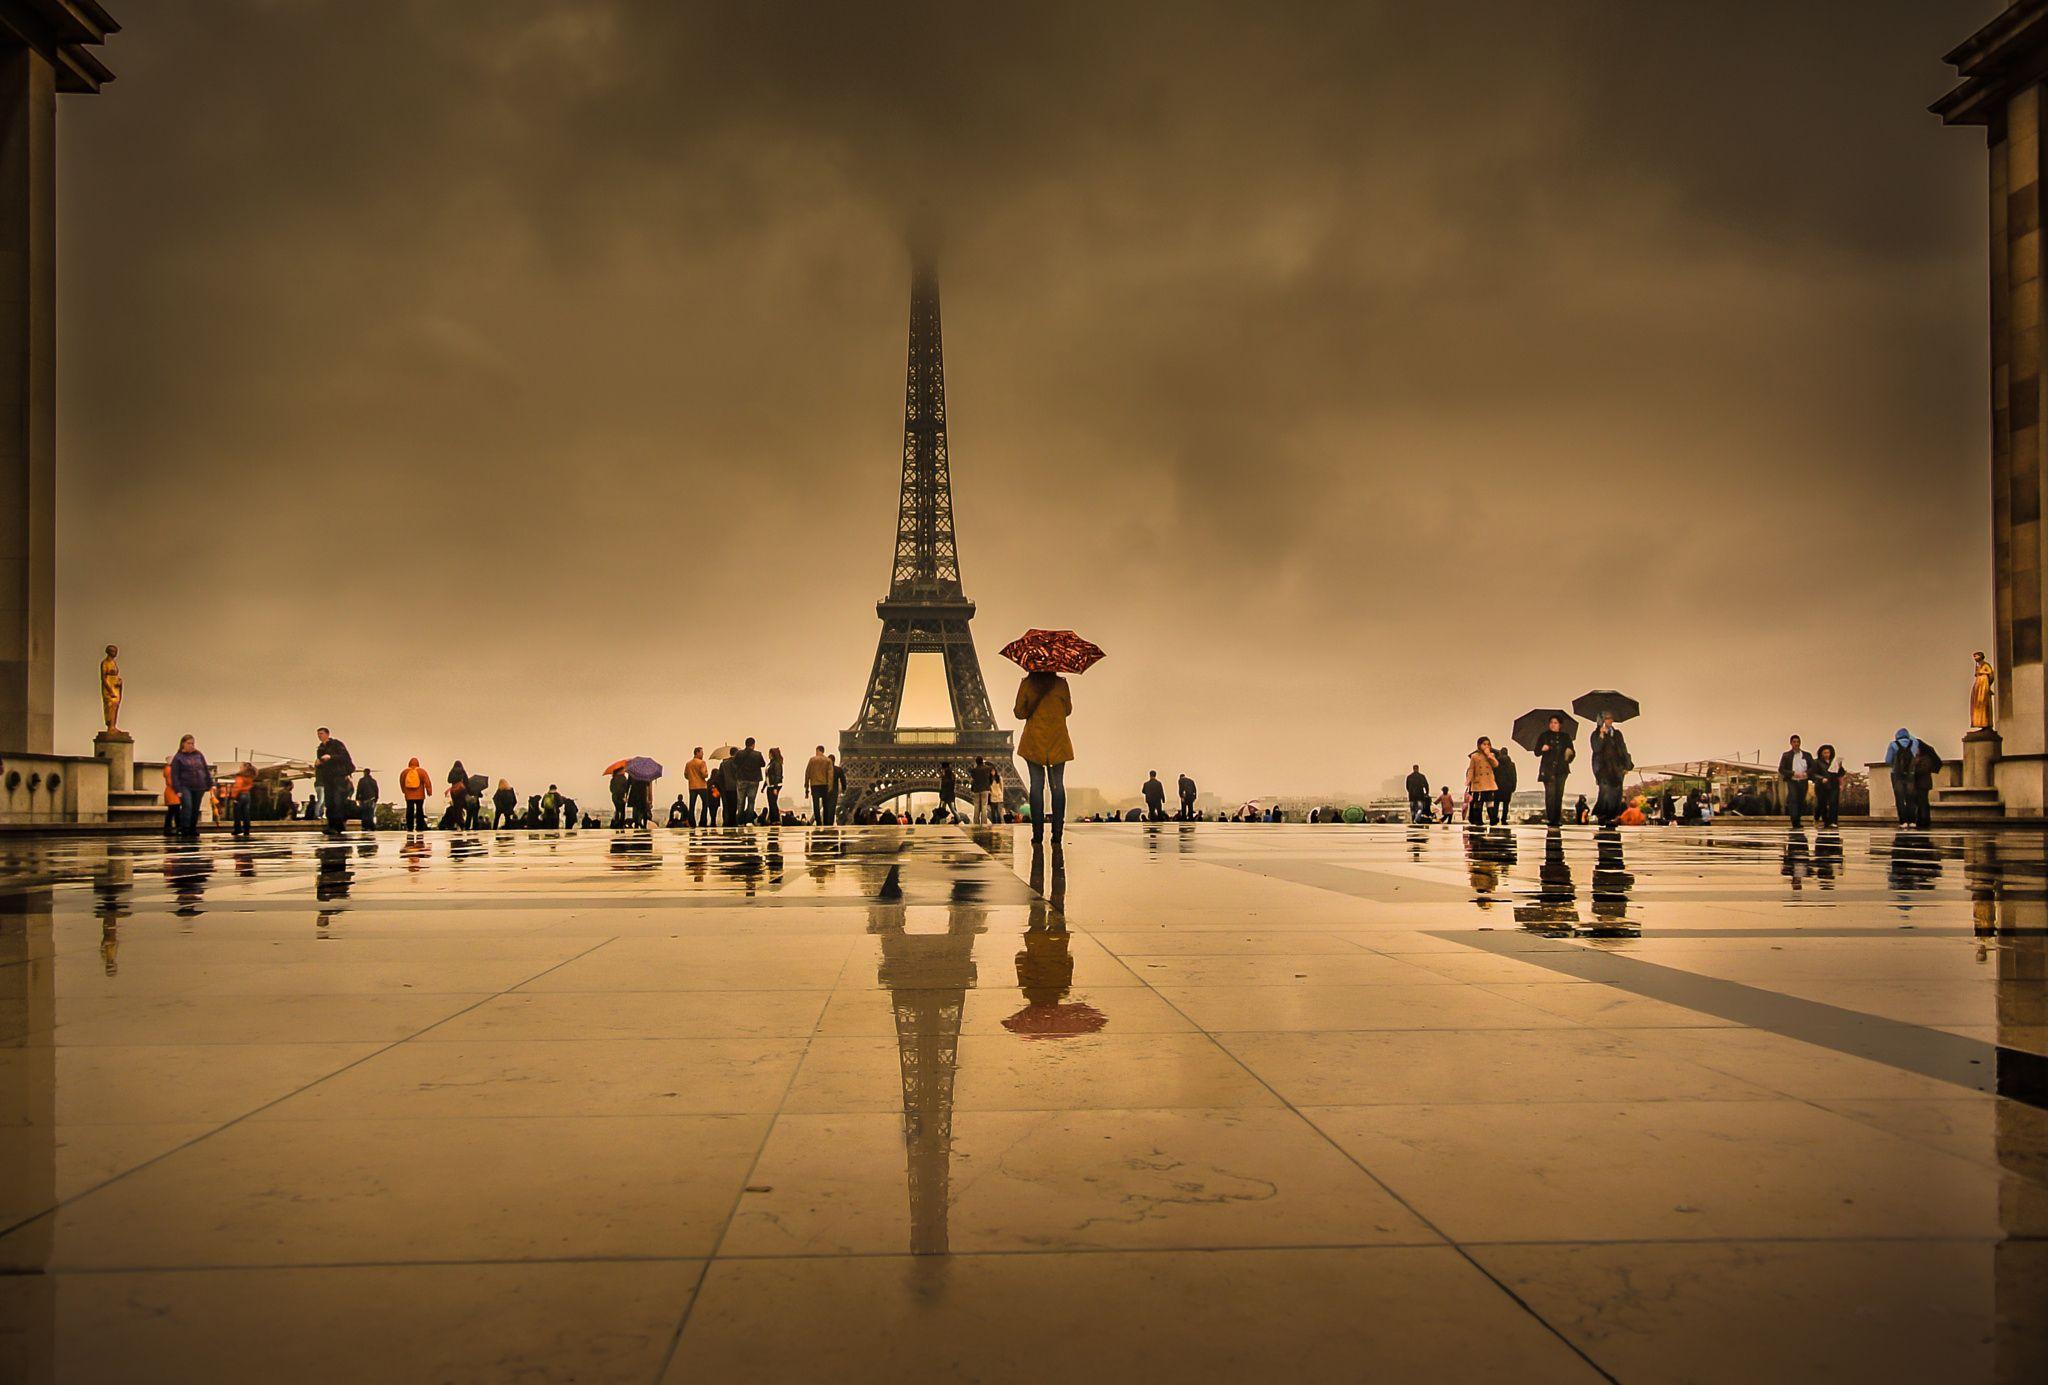 Photo Paris in rain by Takeshi Ishizaki on 500px